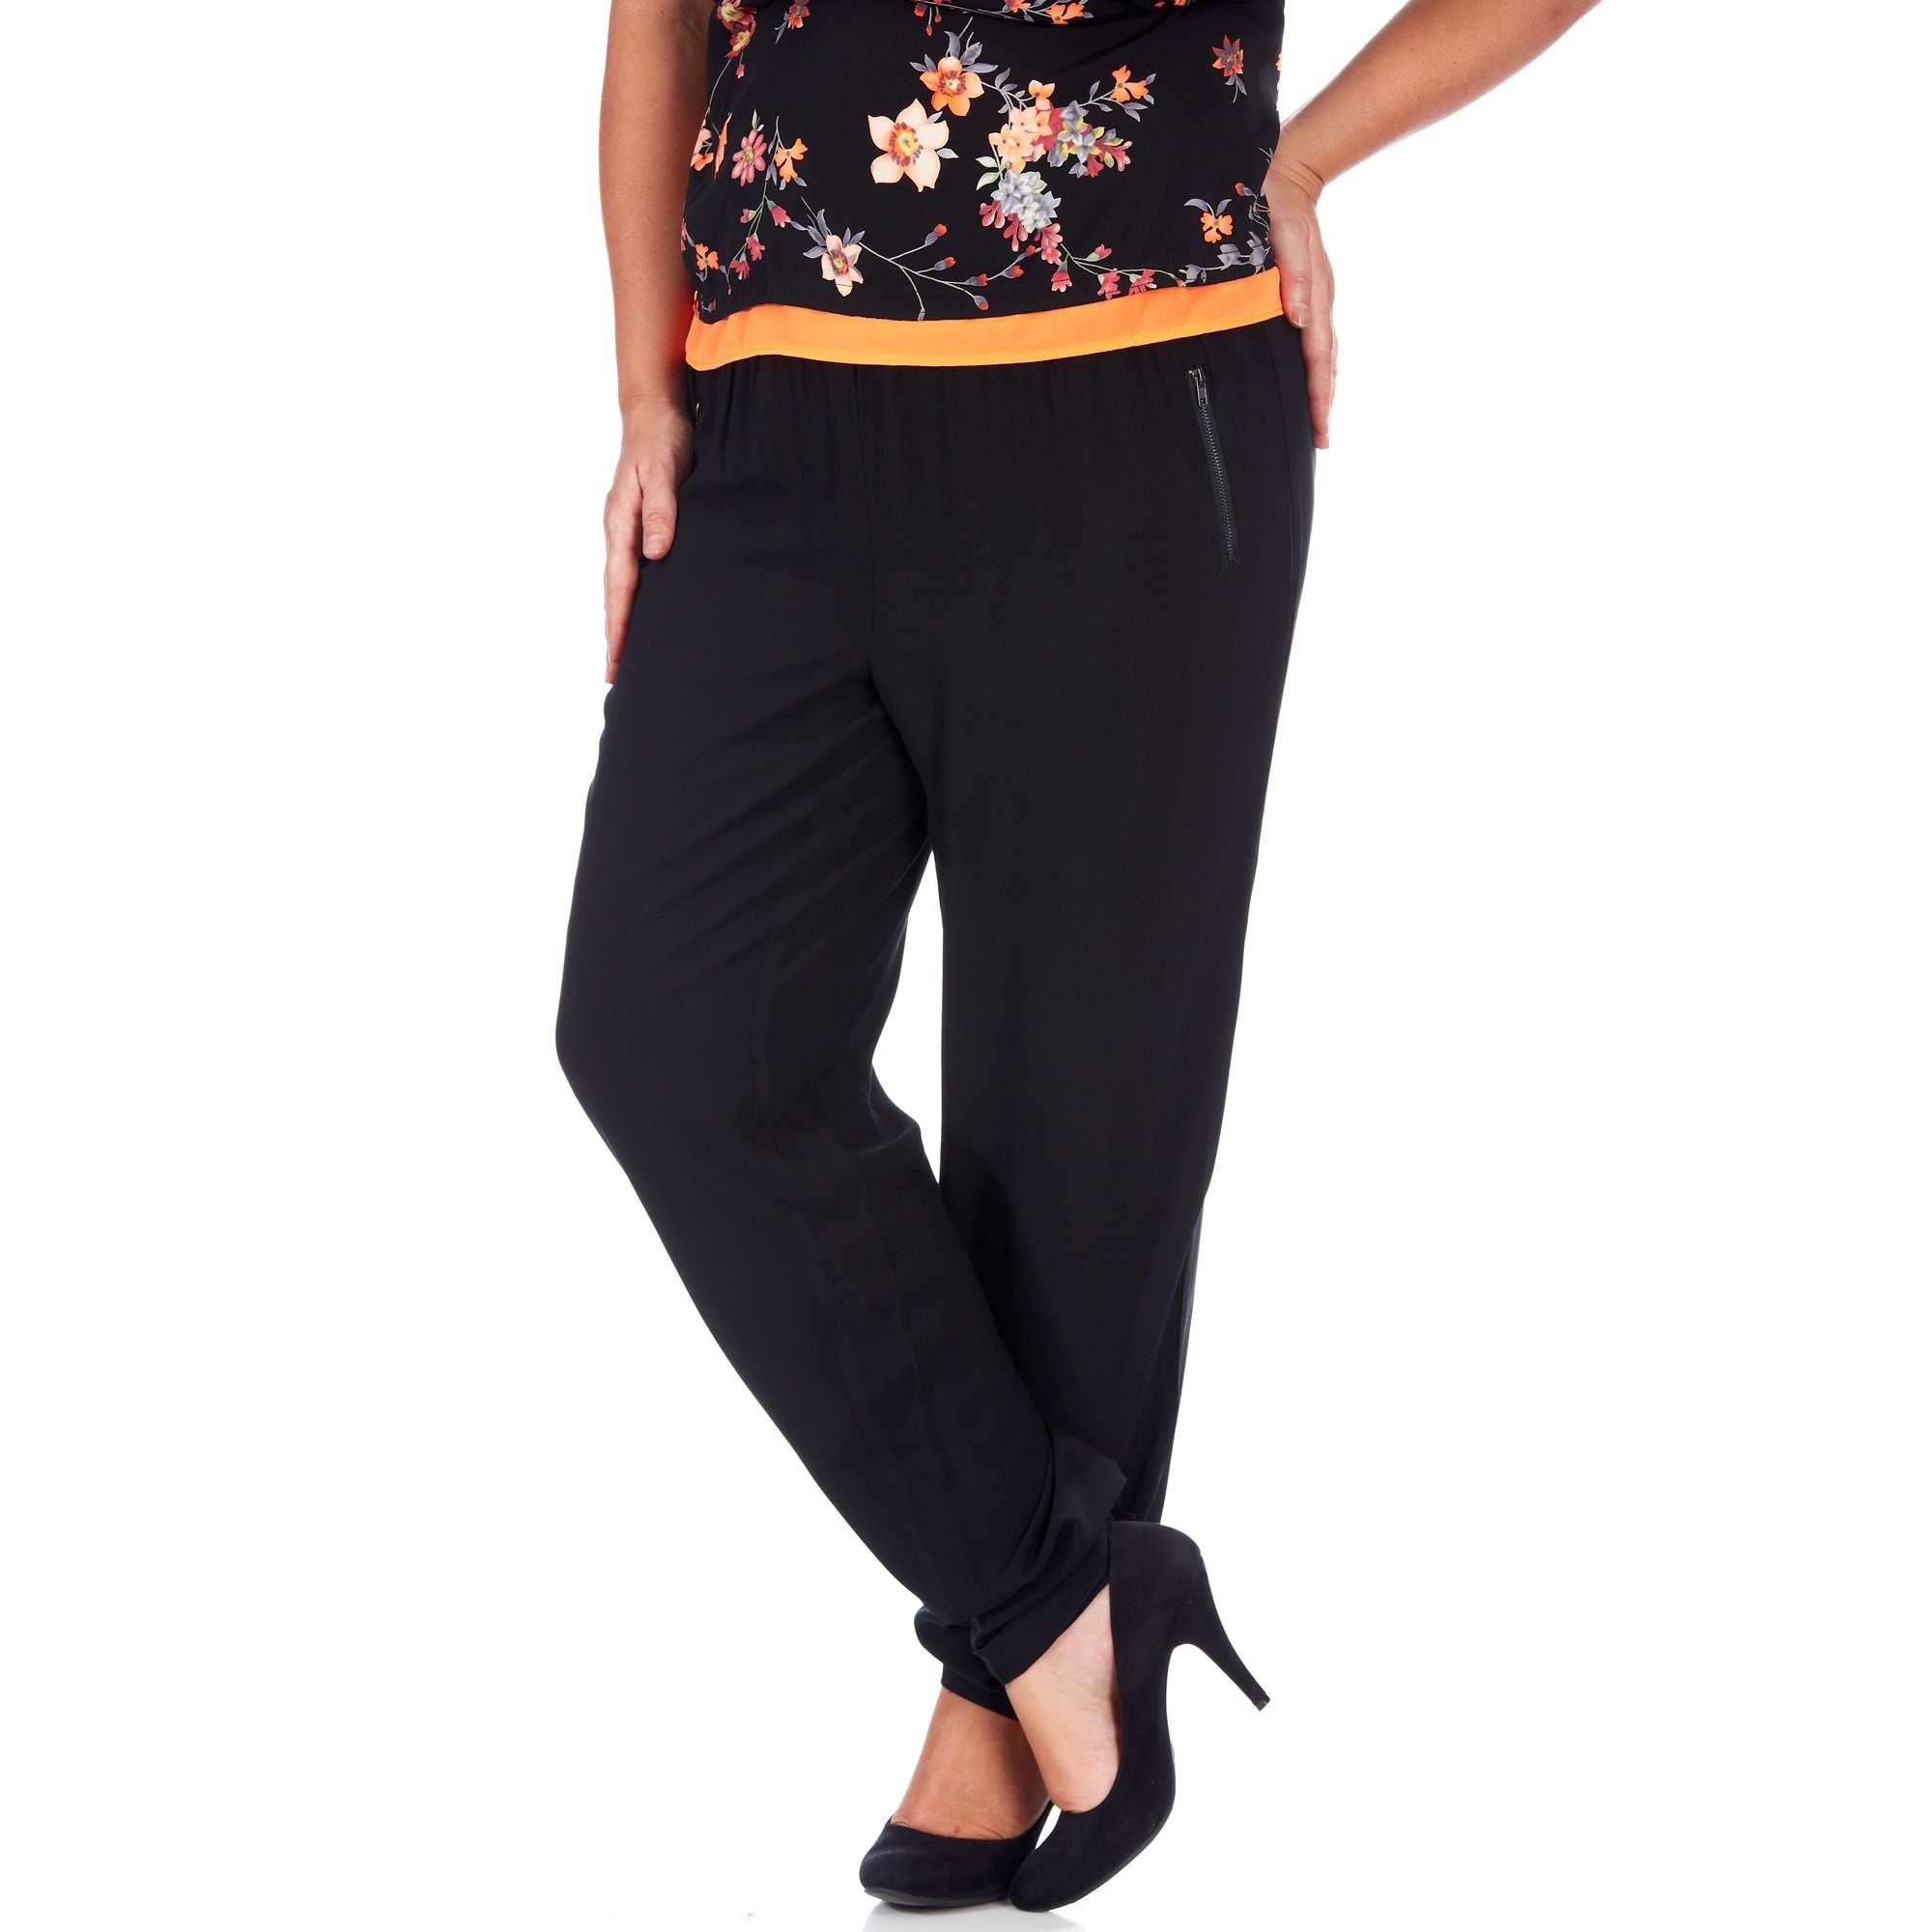 pantalon large fluide grande taille femme kiabi 20 00. Black Bedroom Furniture Sets. Home Design Ideas